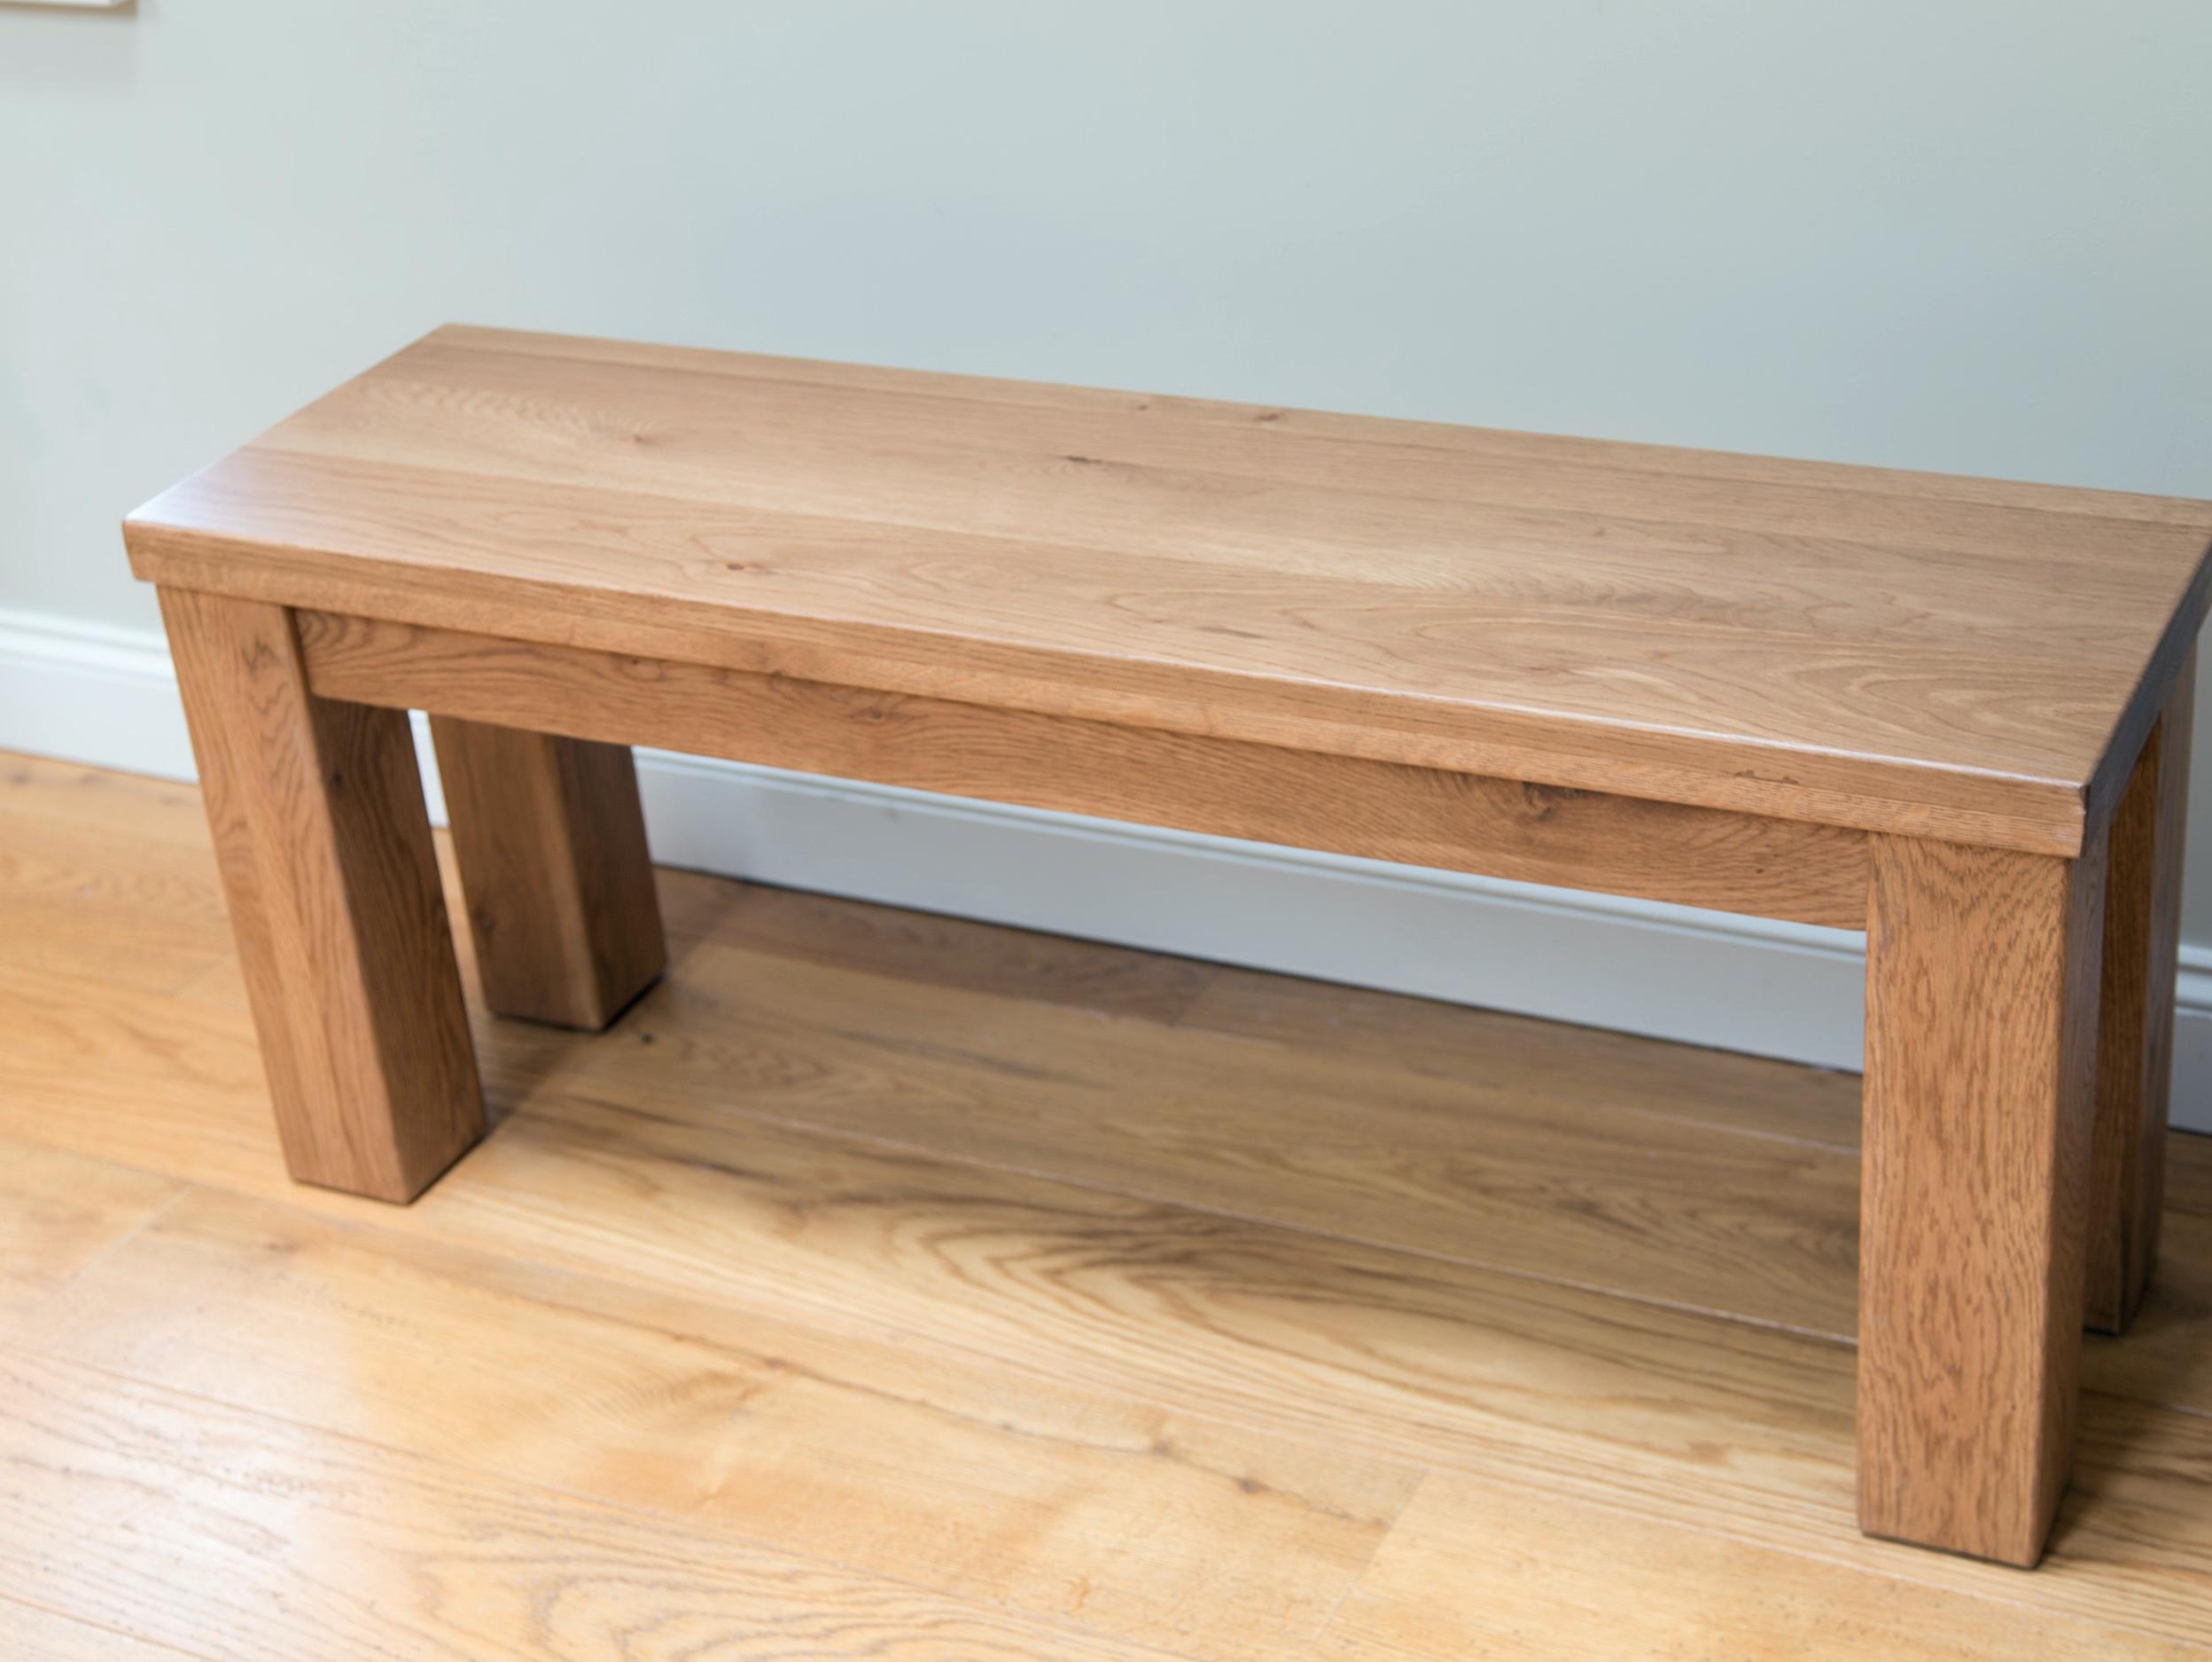 Rustic Wood Bench Designs